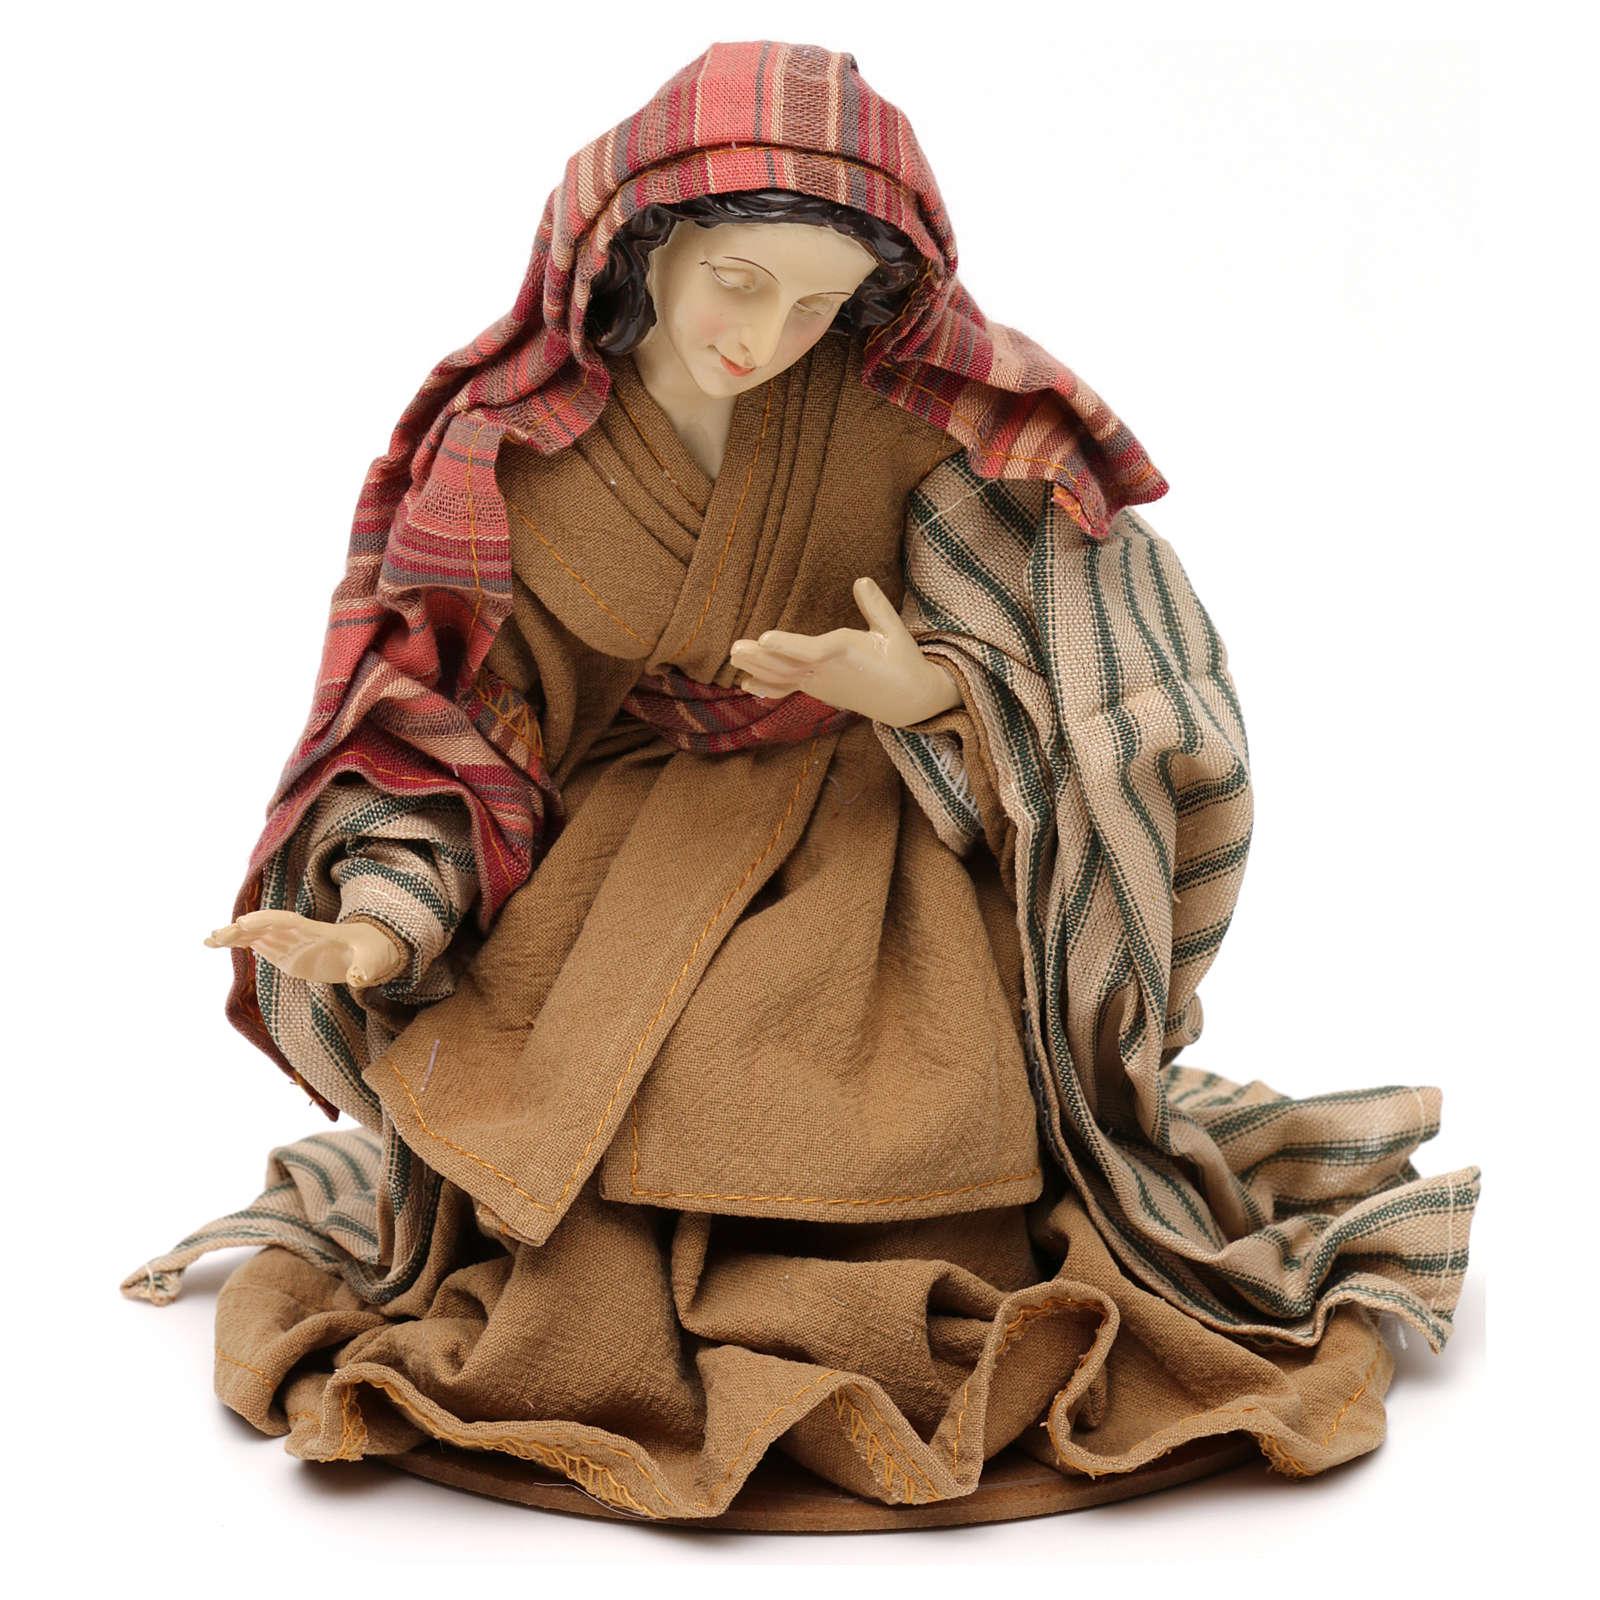 Nativity scene statues Holy Family Eastern style in resin 30 cm 3